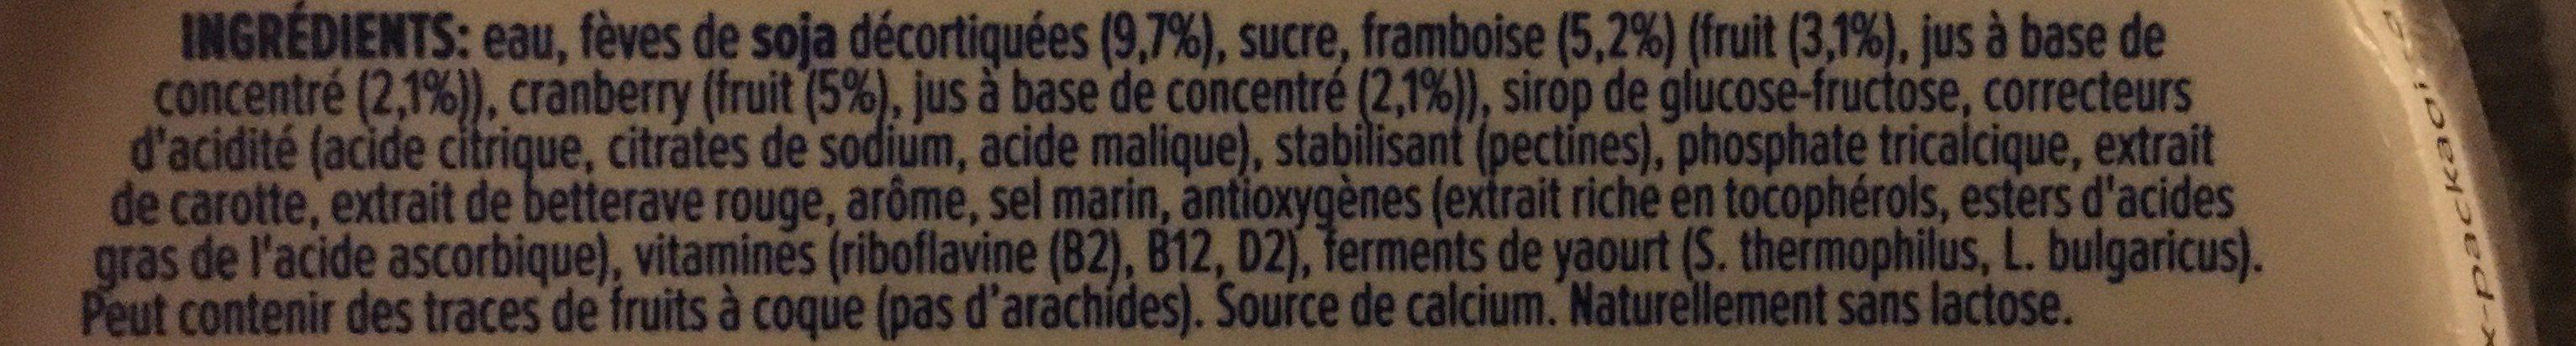 Himbeere-Cranberry - Ingrédients - fr